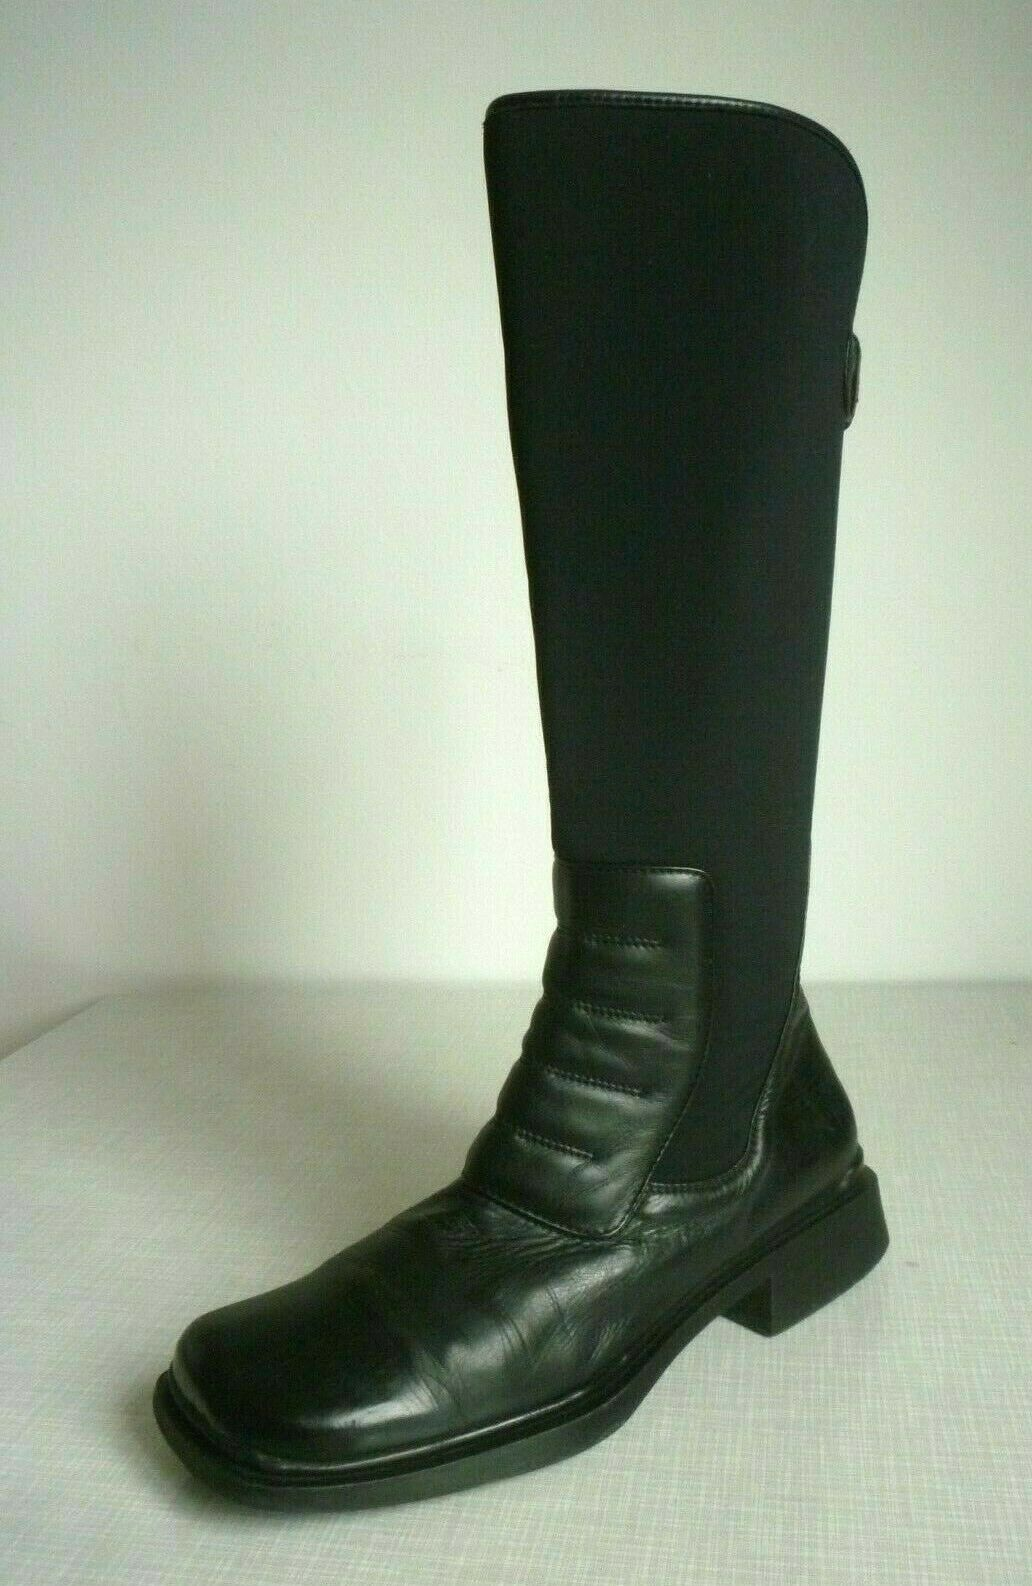 Echt Leder Schaftstiefel schwarz Langschaft Stiefel Elastikschaft Vintage 40 TOP